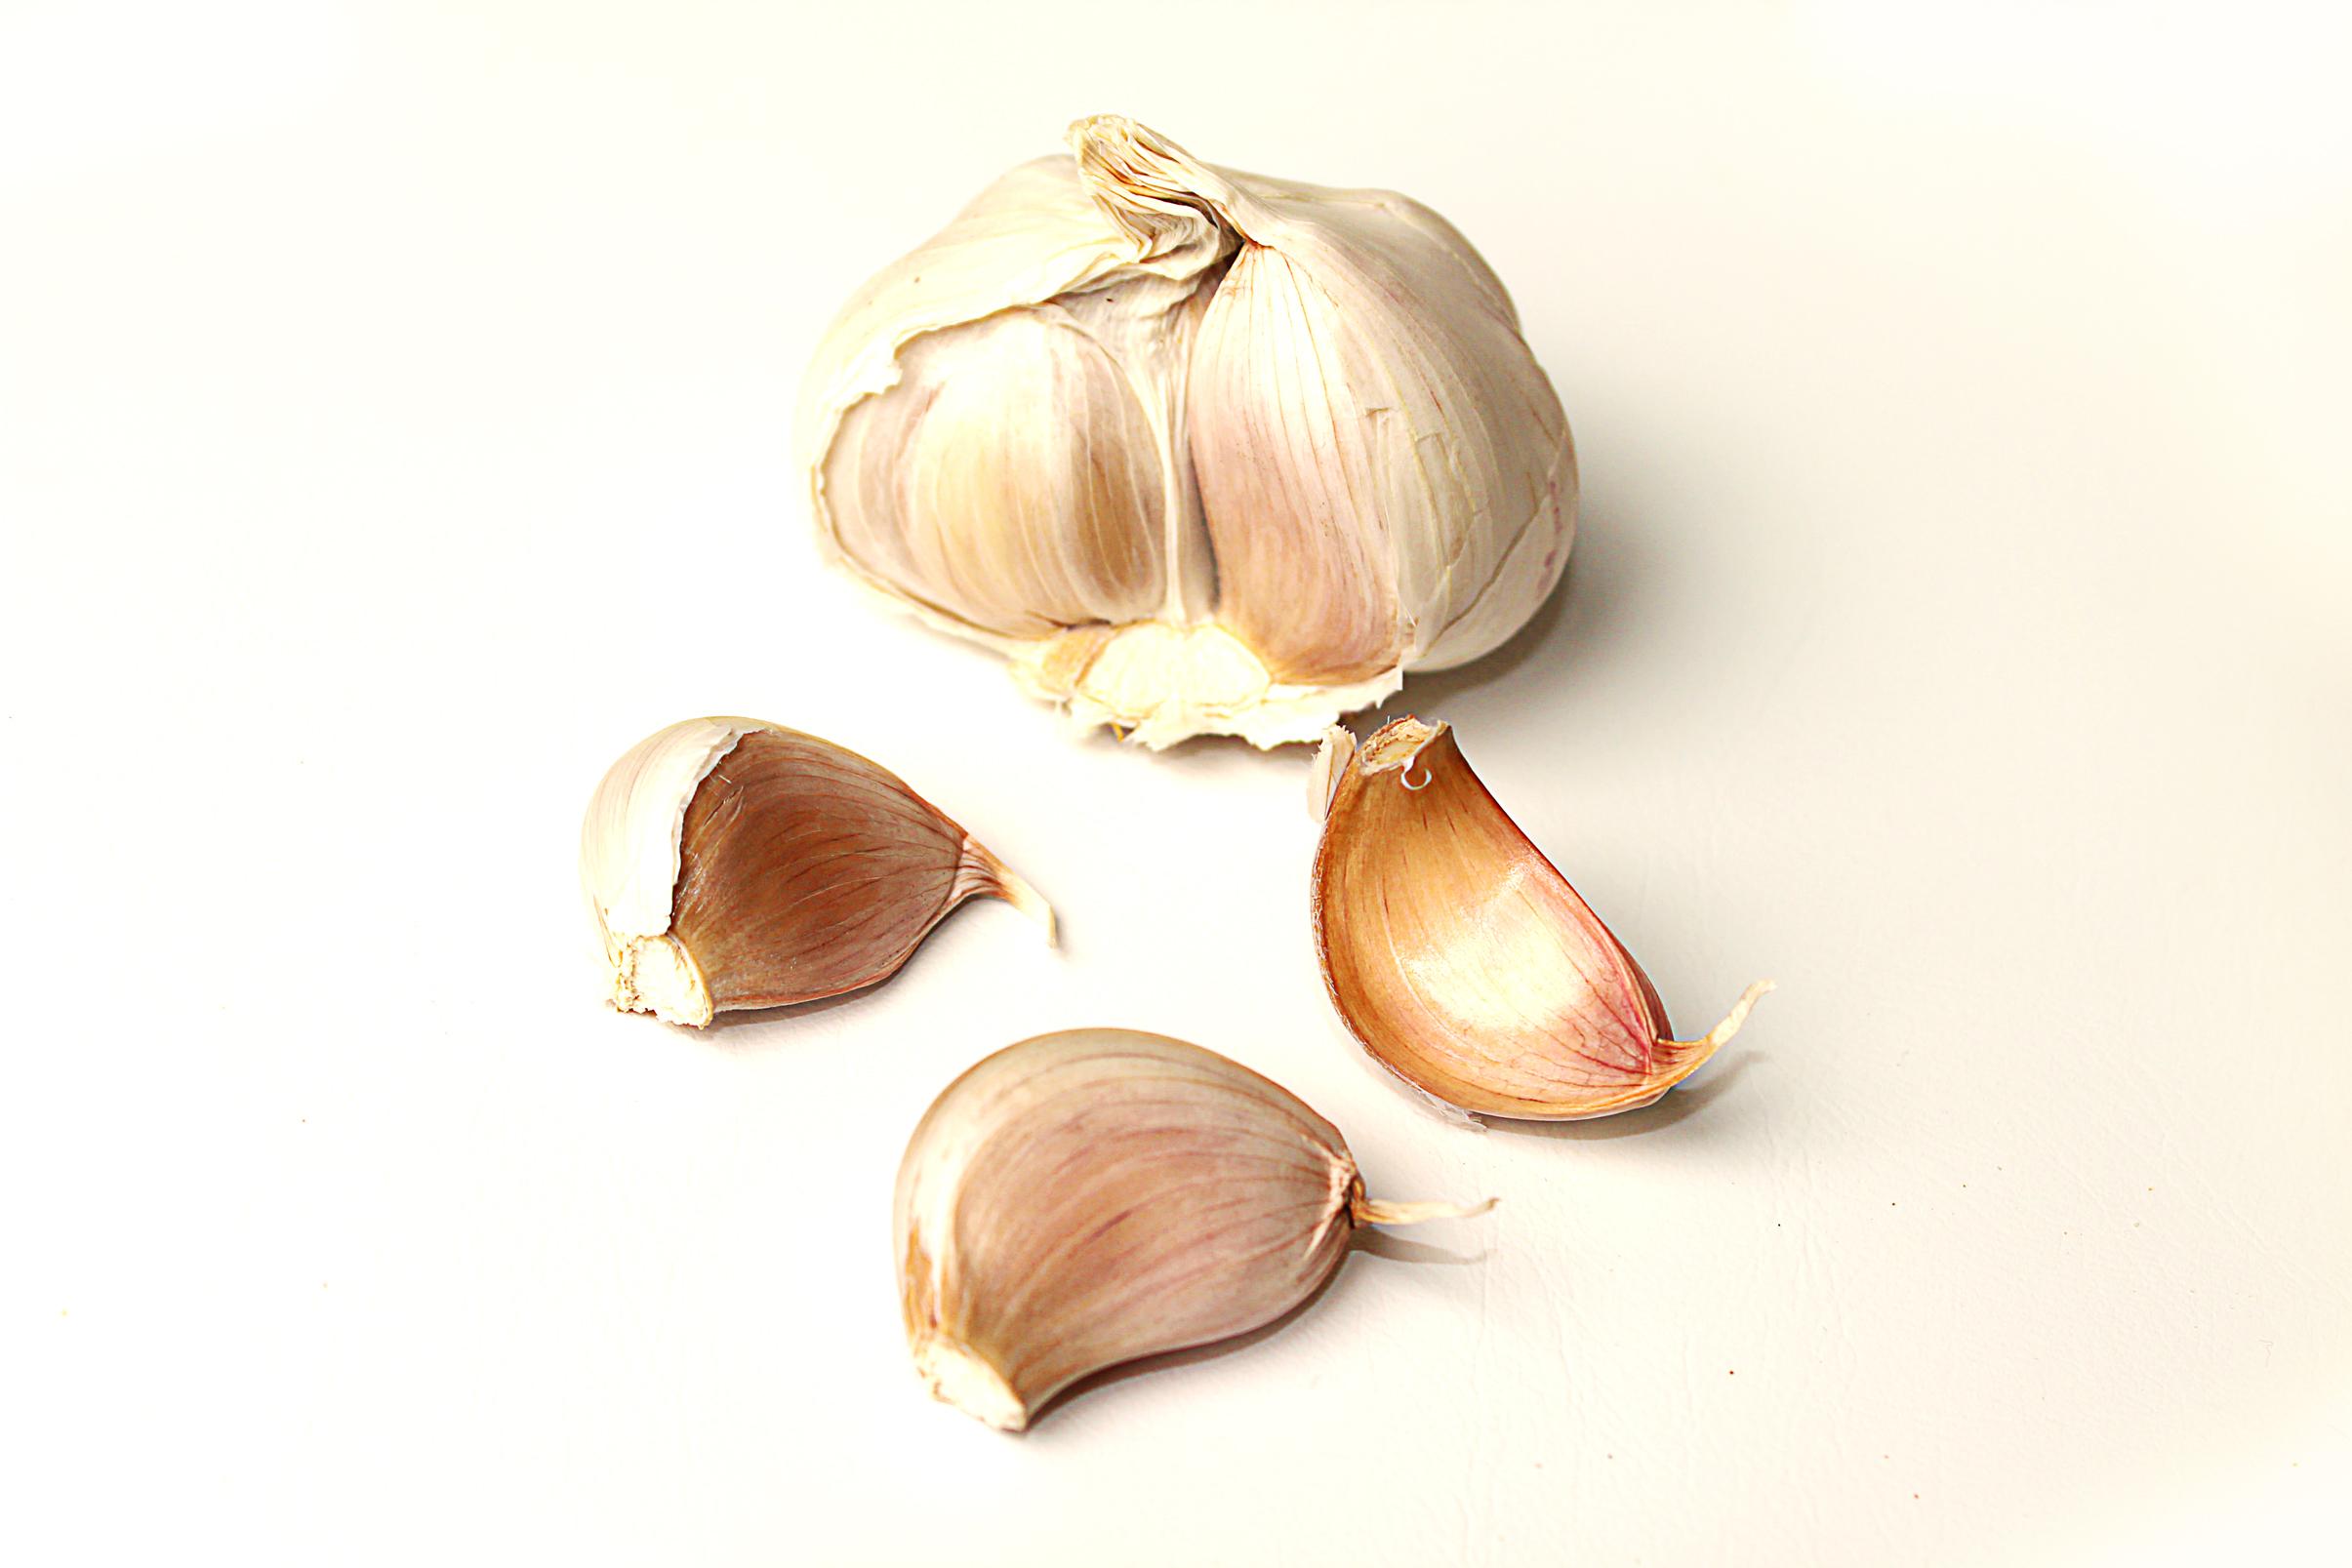 Garlic on white background, Aromatic, Nutrition, Vitamins, Vegetables, HQ Photo